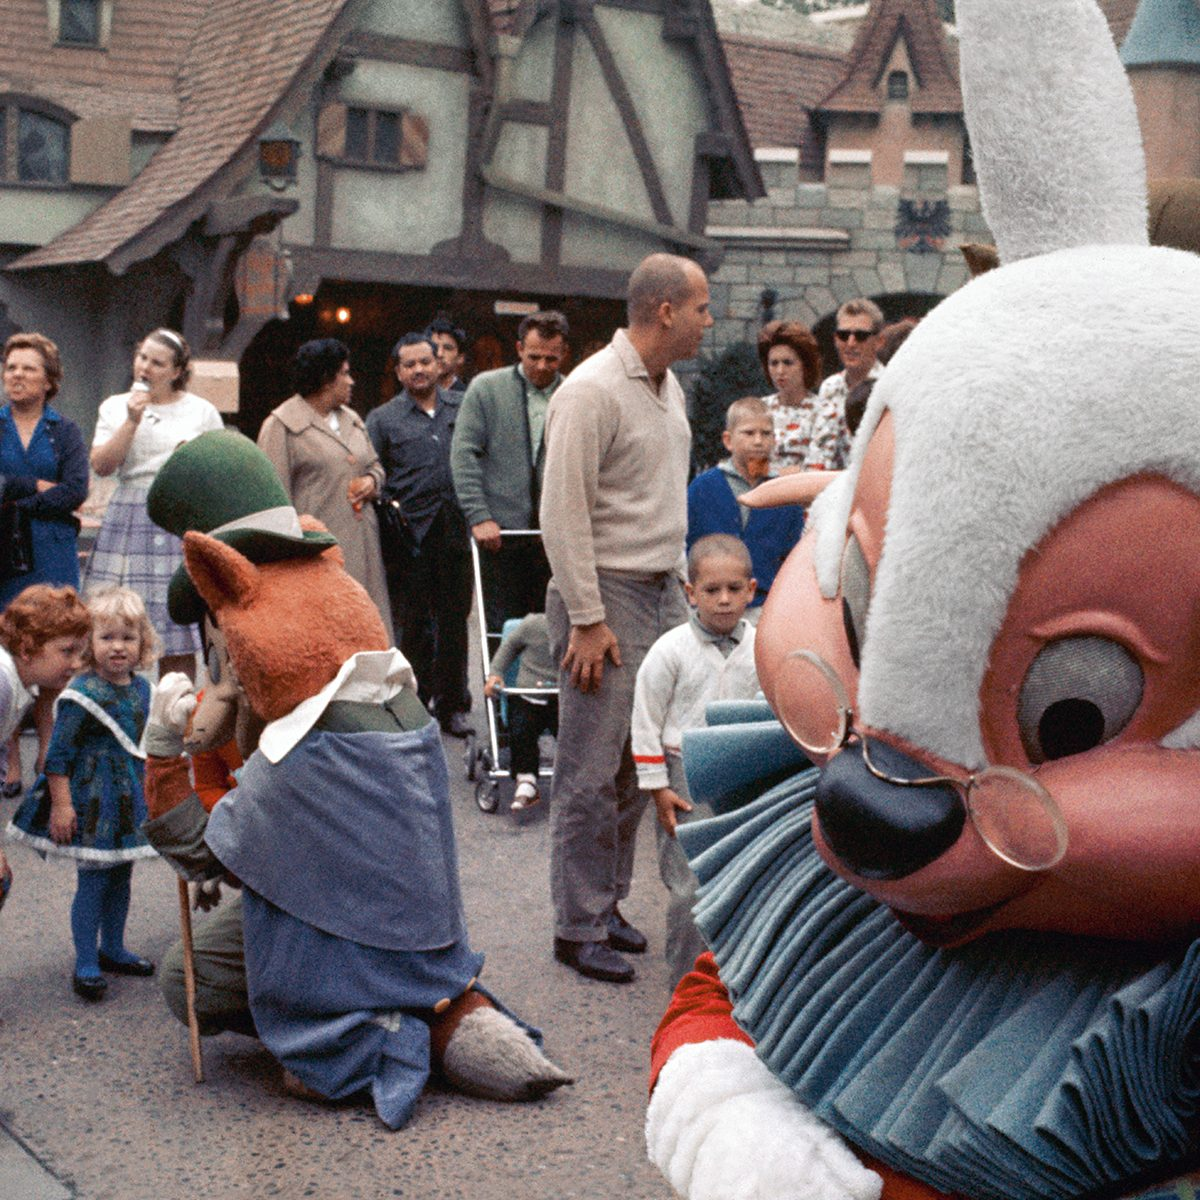 ANAHEIM, CA - 1963: Disney characters entertain children in the Fantasyland area of Disneyland in1963 in Anaheim, California. (Photo by David Attie/Getty Images)